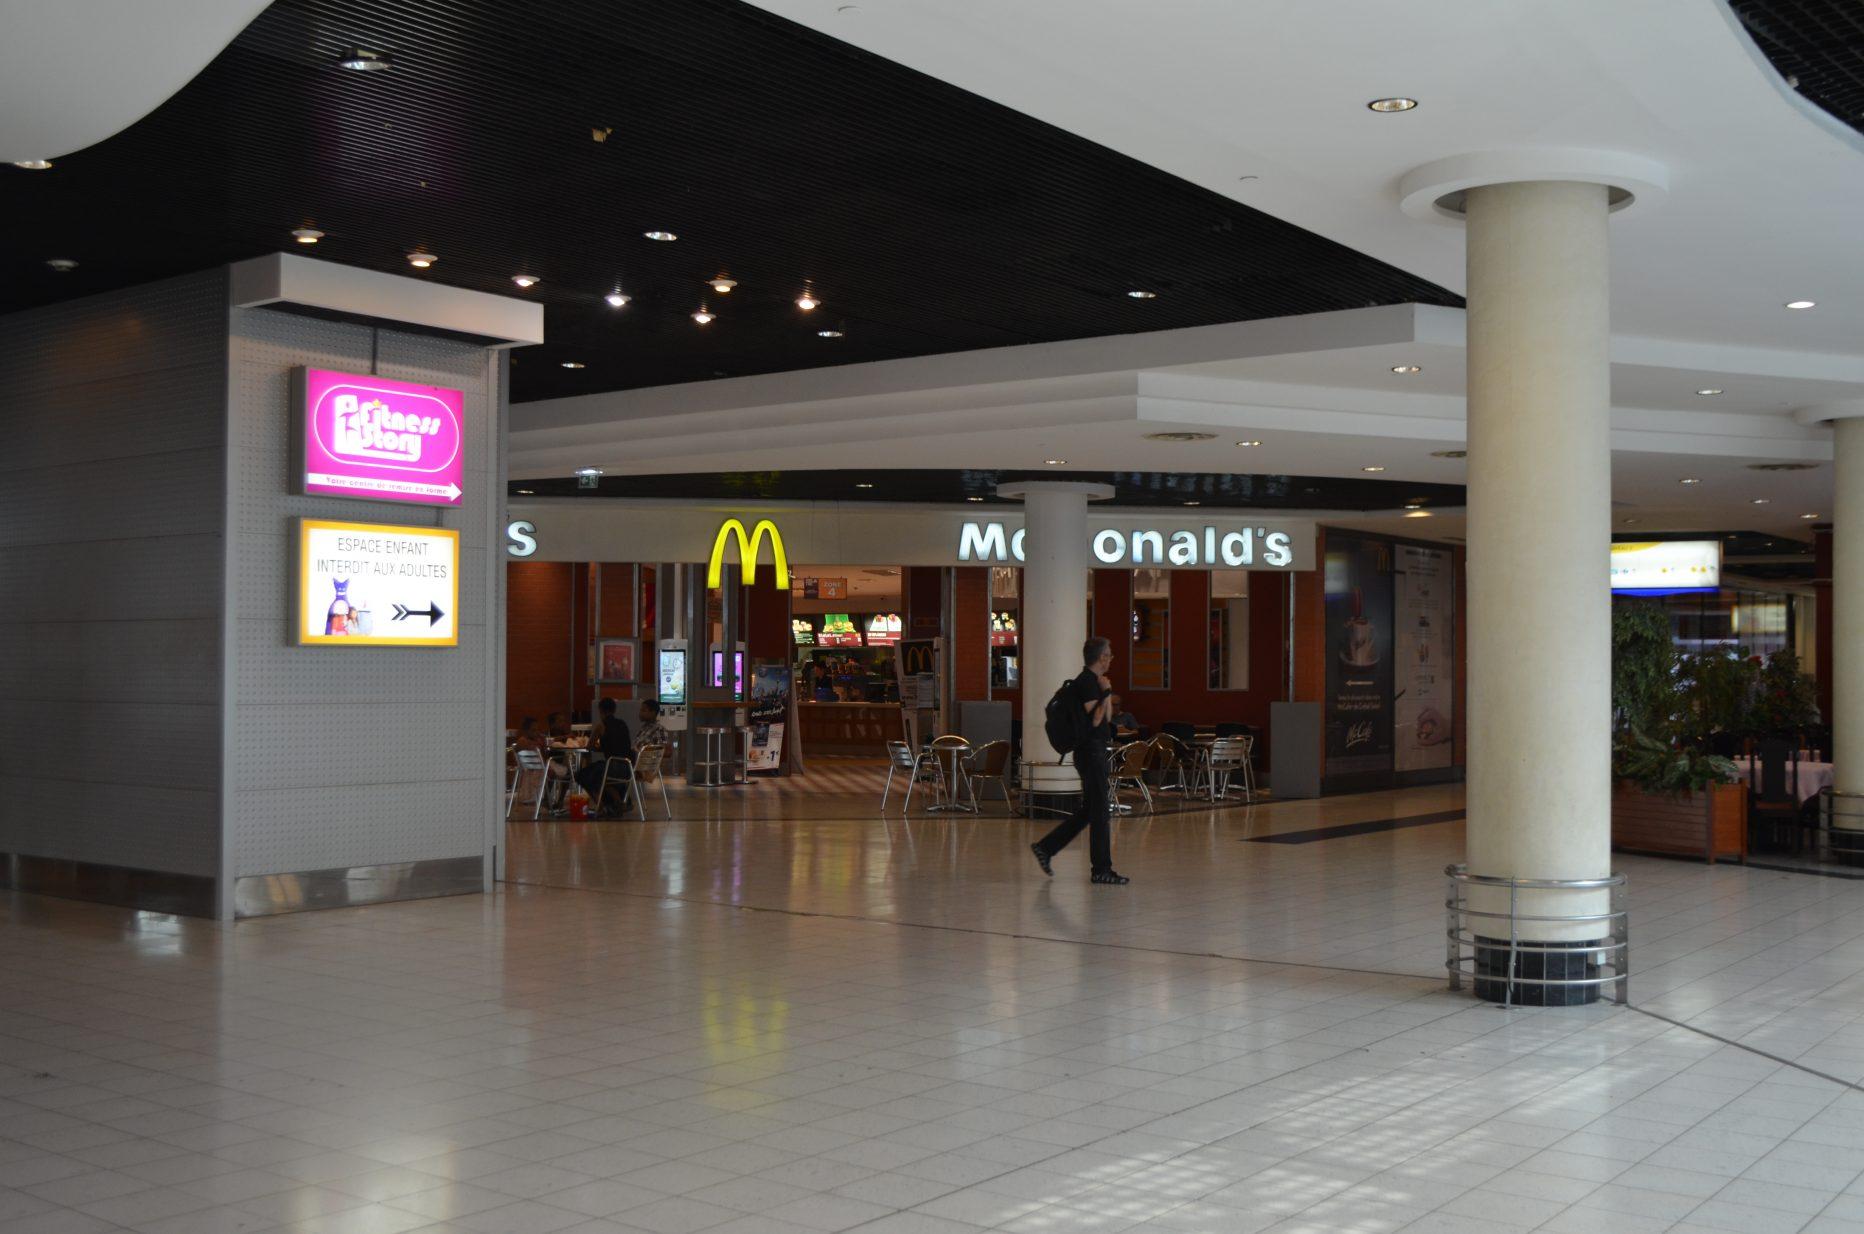 McDonald's Creteil soleil